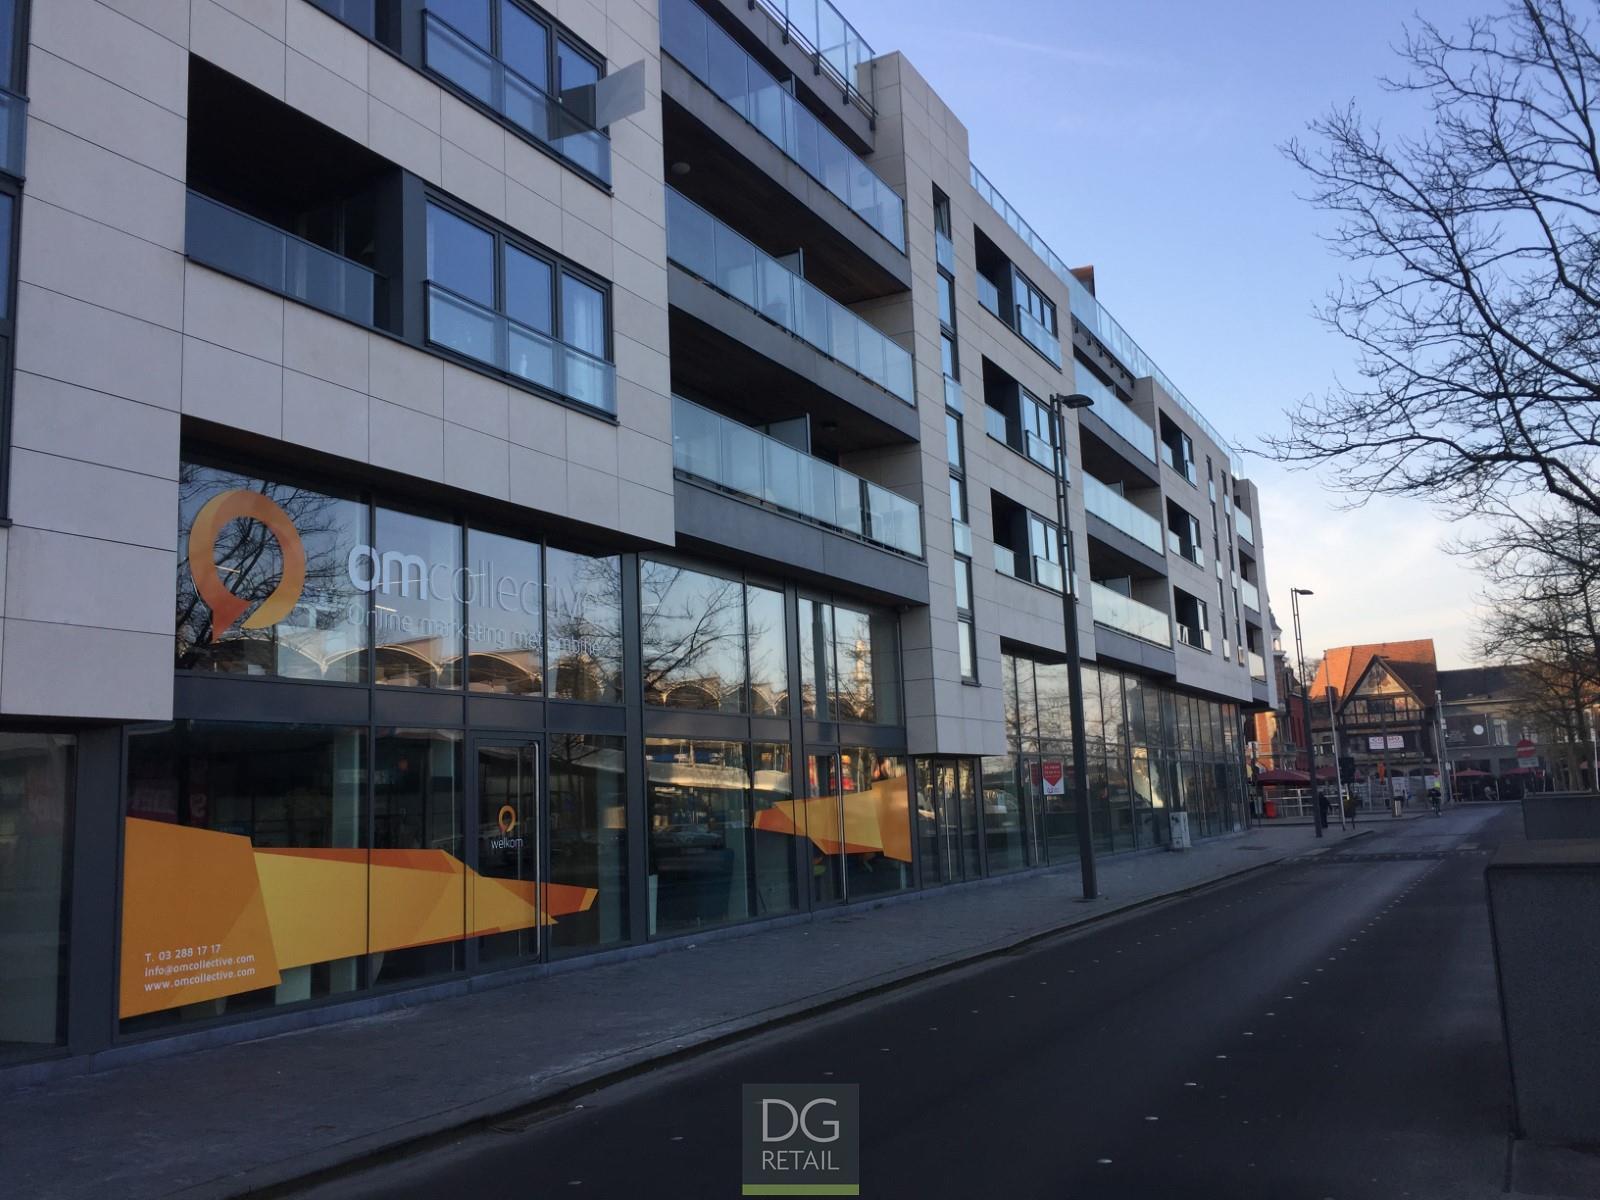 commercieel gelijkvloers te koop 'Plaza Express' (R1131)  - Stationsplein  , 9100 Sint-Niklaas, België 1